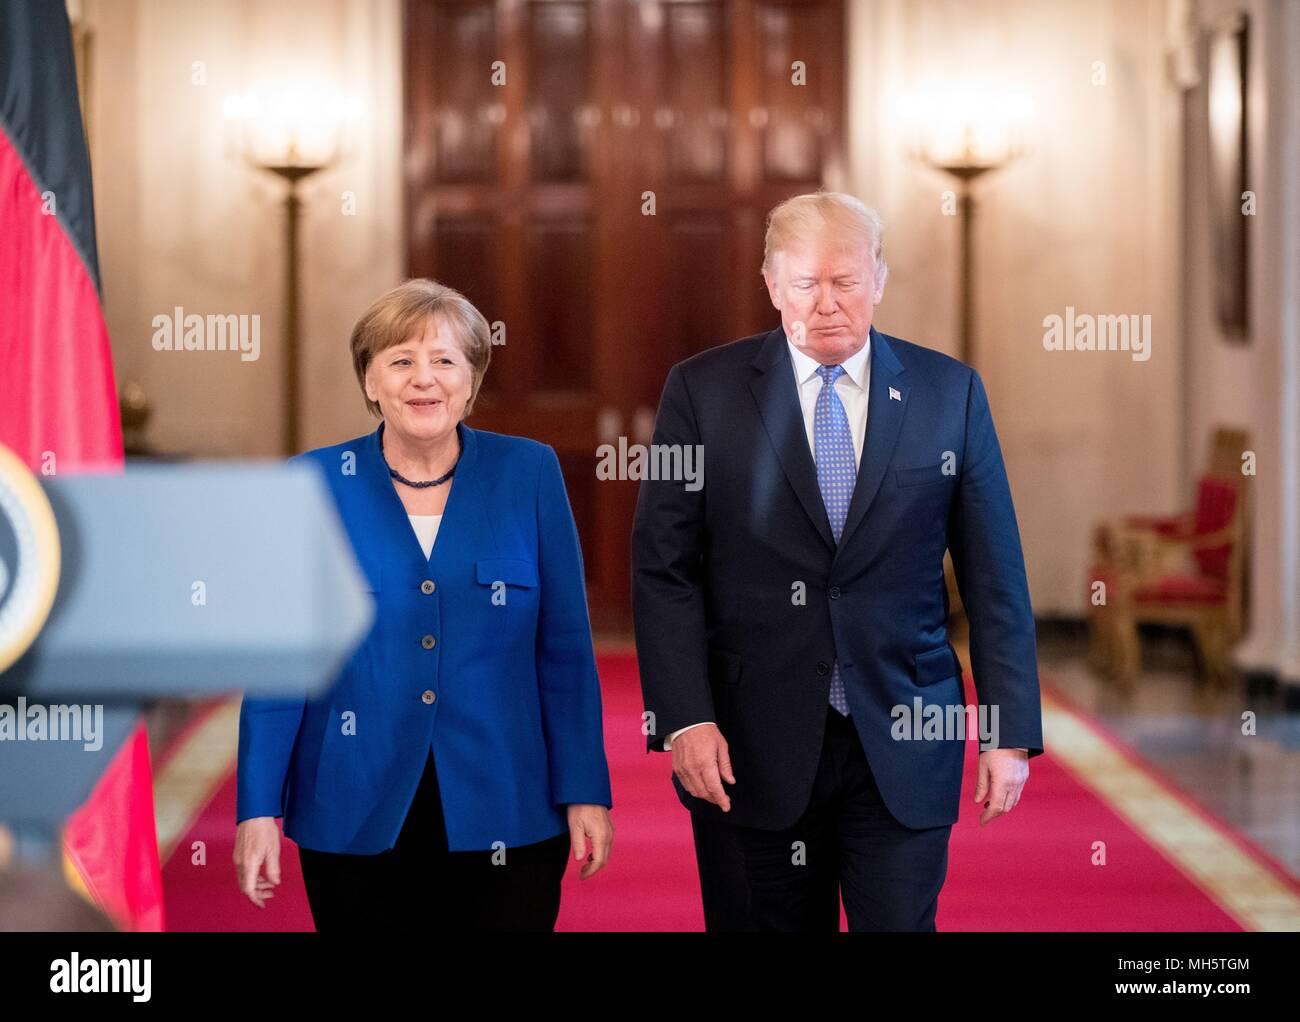 27 April 2018, USA, Washington: German Chancellor Angela Merkel (CDU) and US President Donald Trump arrive to the White House. Photo: Kay Nietfeld/dpa - Stock Image